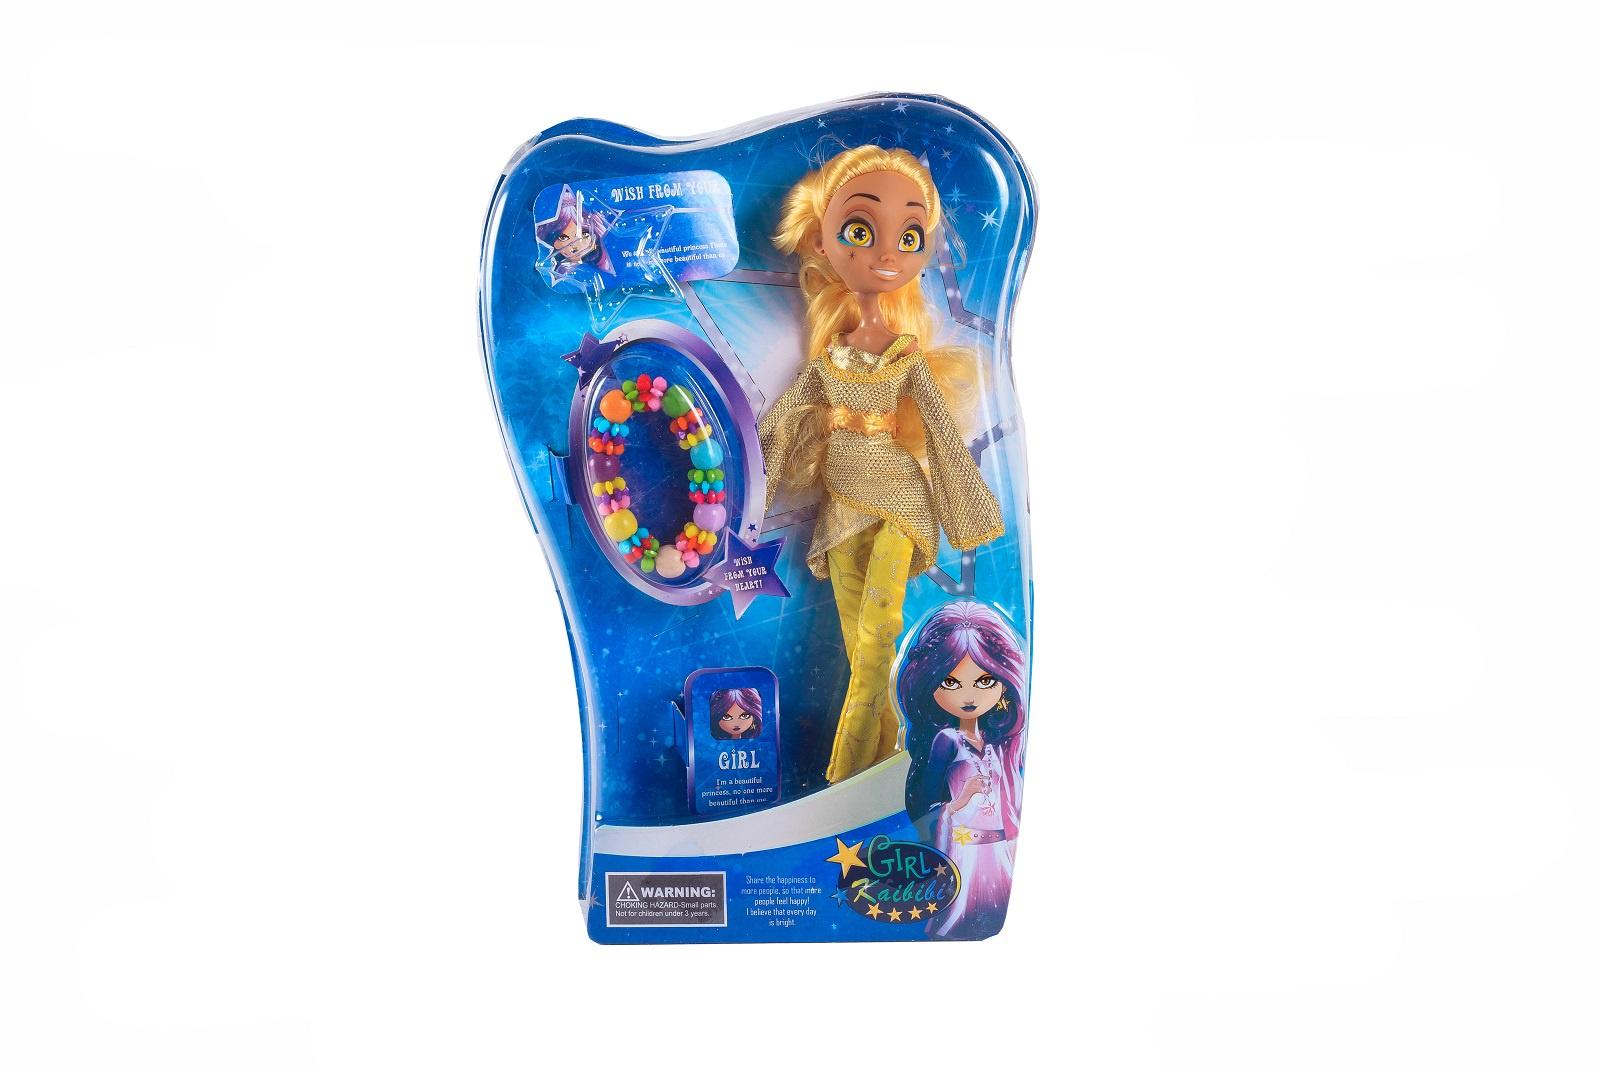 Кукла с аксессуарами, 200038725